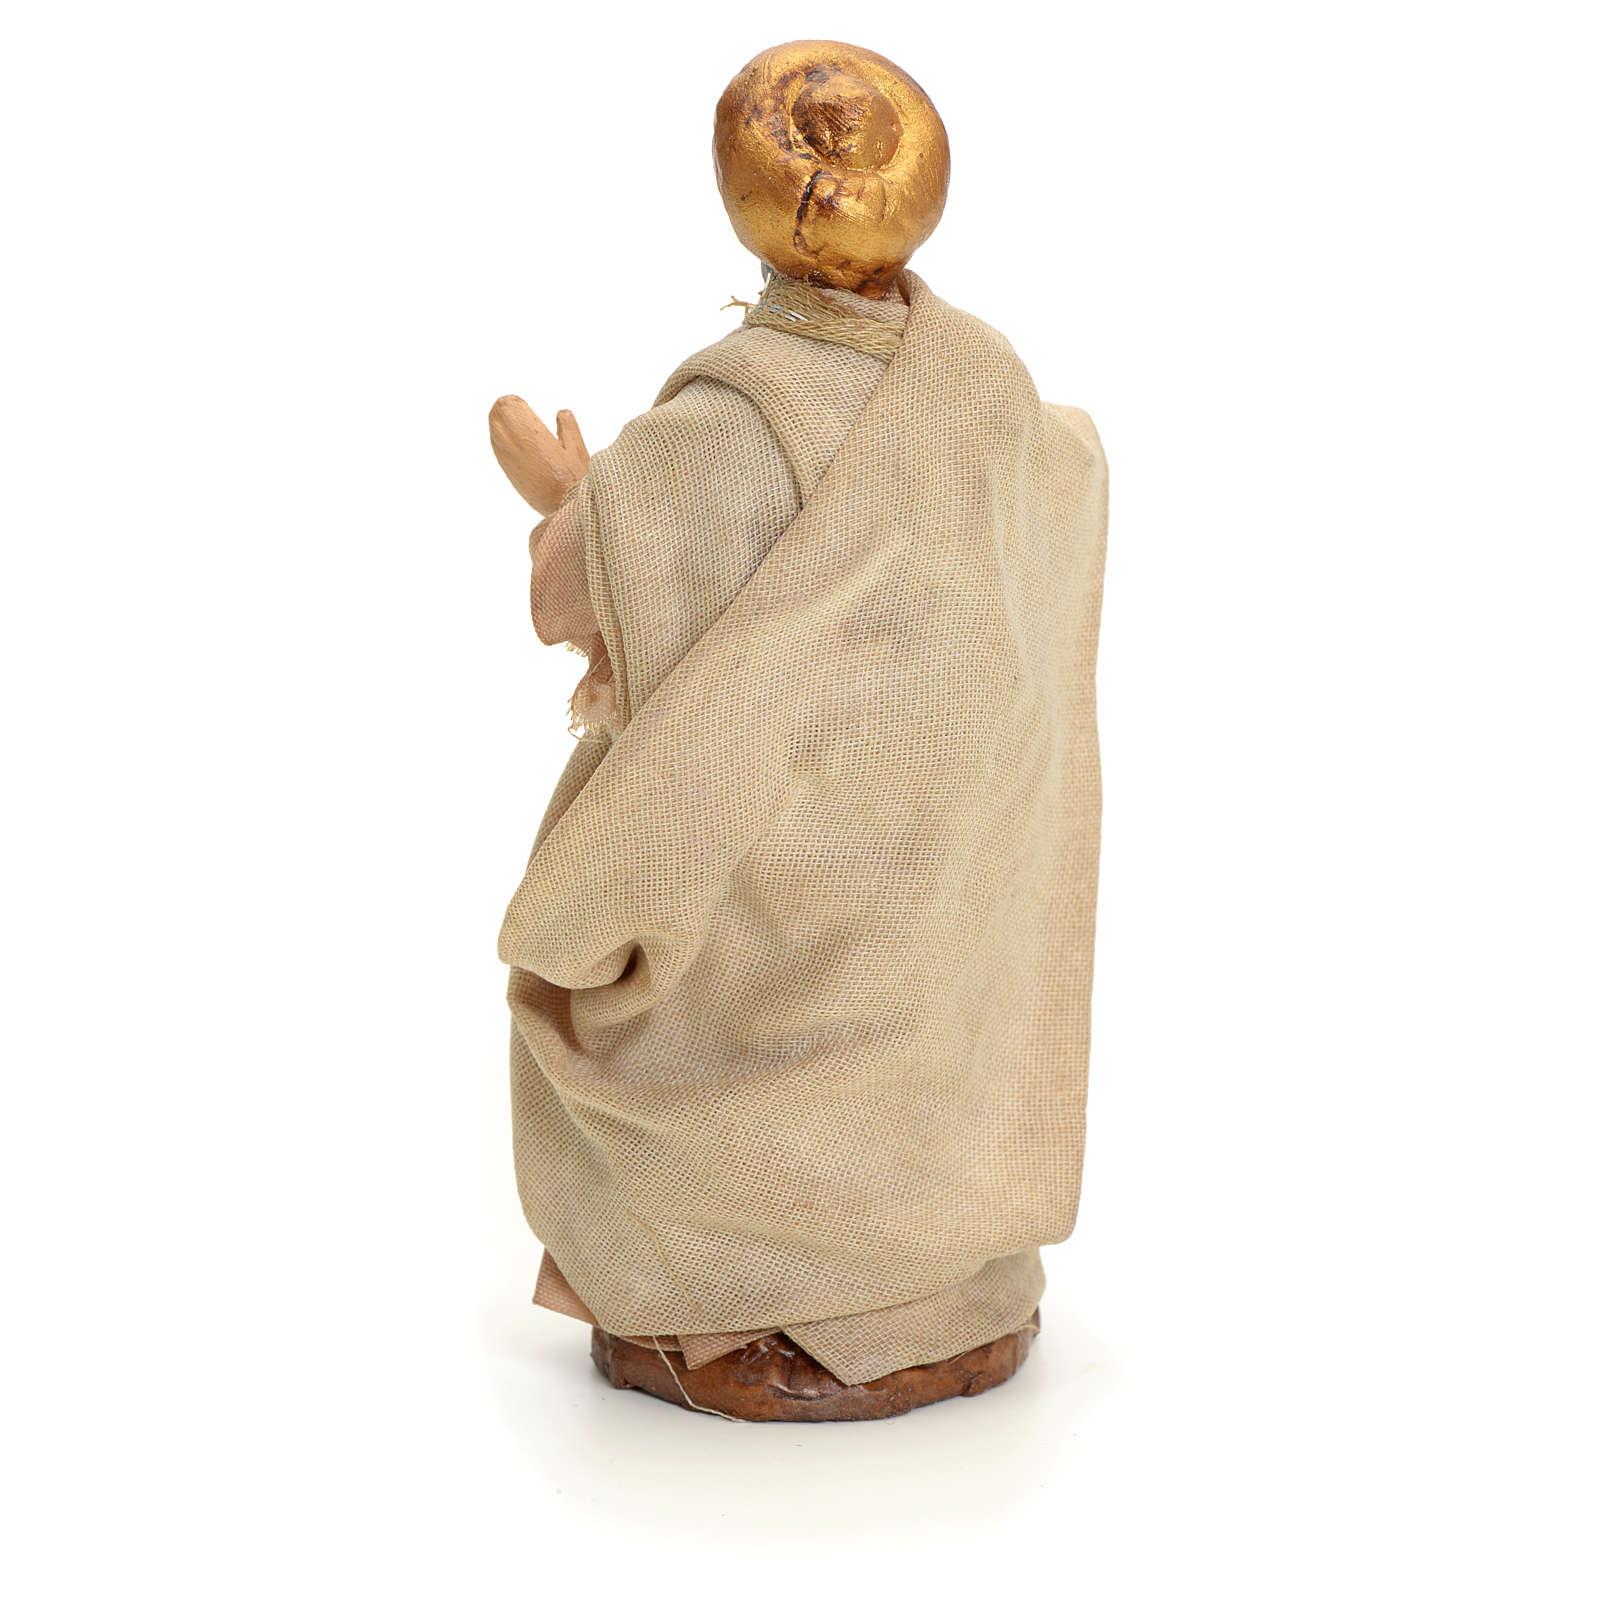 Neapolitan nativity figurine, Arabian man walking, 8cm 4